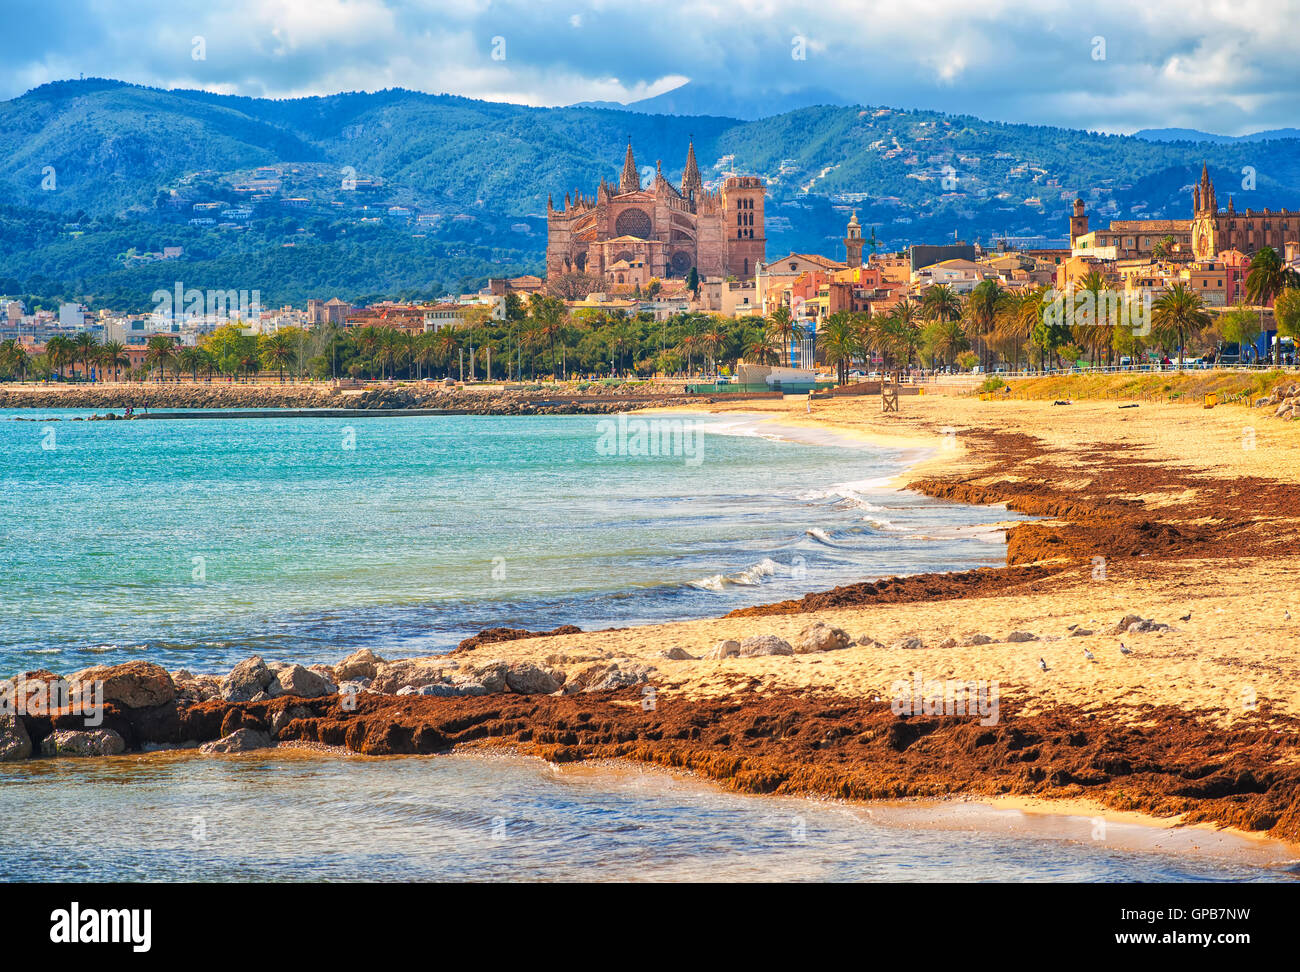 Sandstrand in Palma De Mallorca, gotische Kathedrale La Seu im Hintergrund, Spanien Stockbild